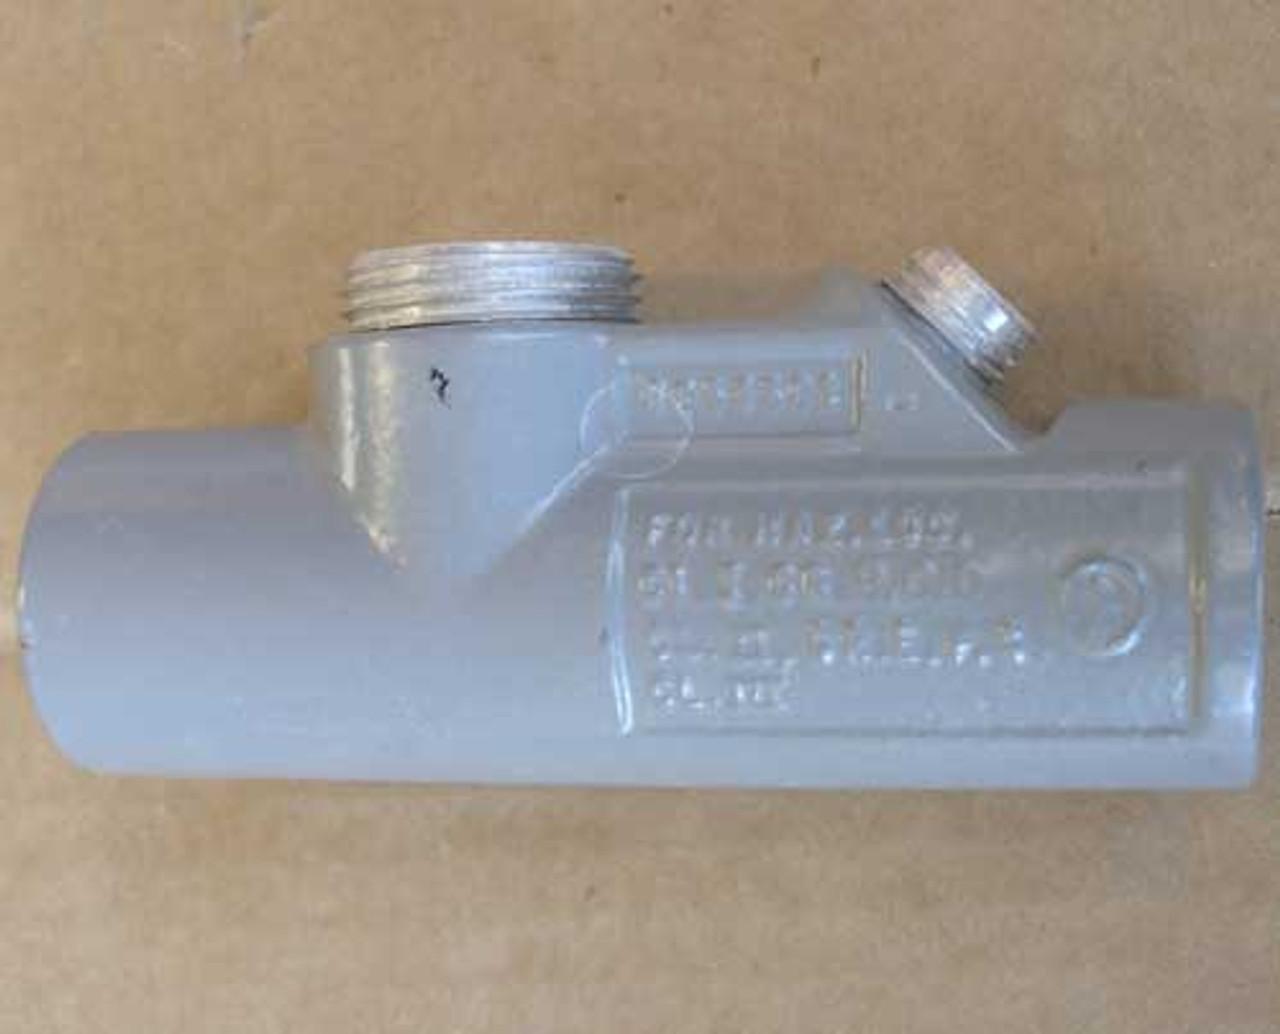 "Hubbell Killark ENY-4 Explosion-Proof Sealing Fitting 1-1/4"" - New"